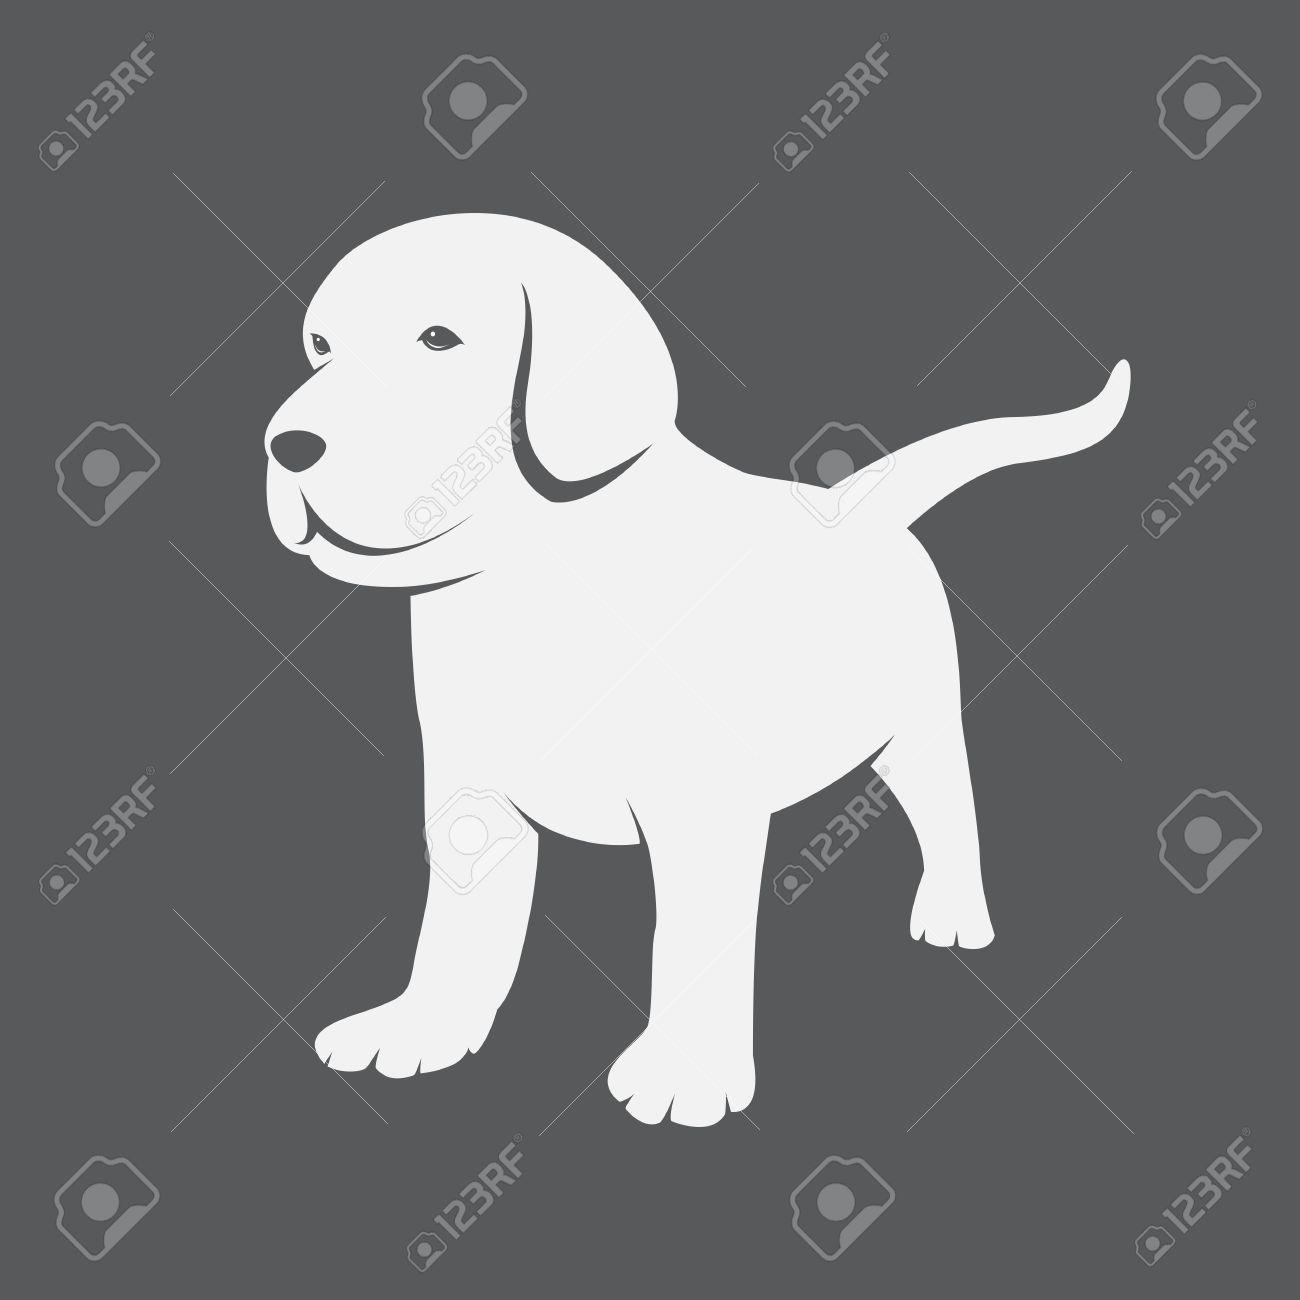 Vector Image Of An Labrador Puppies Royalty Free Cliparts Vectors